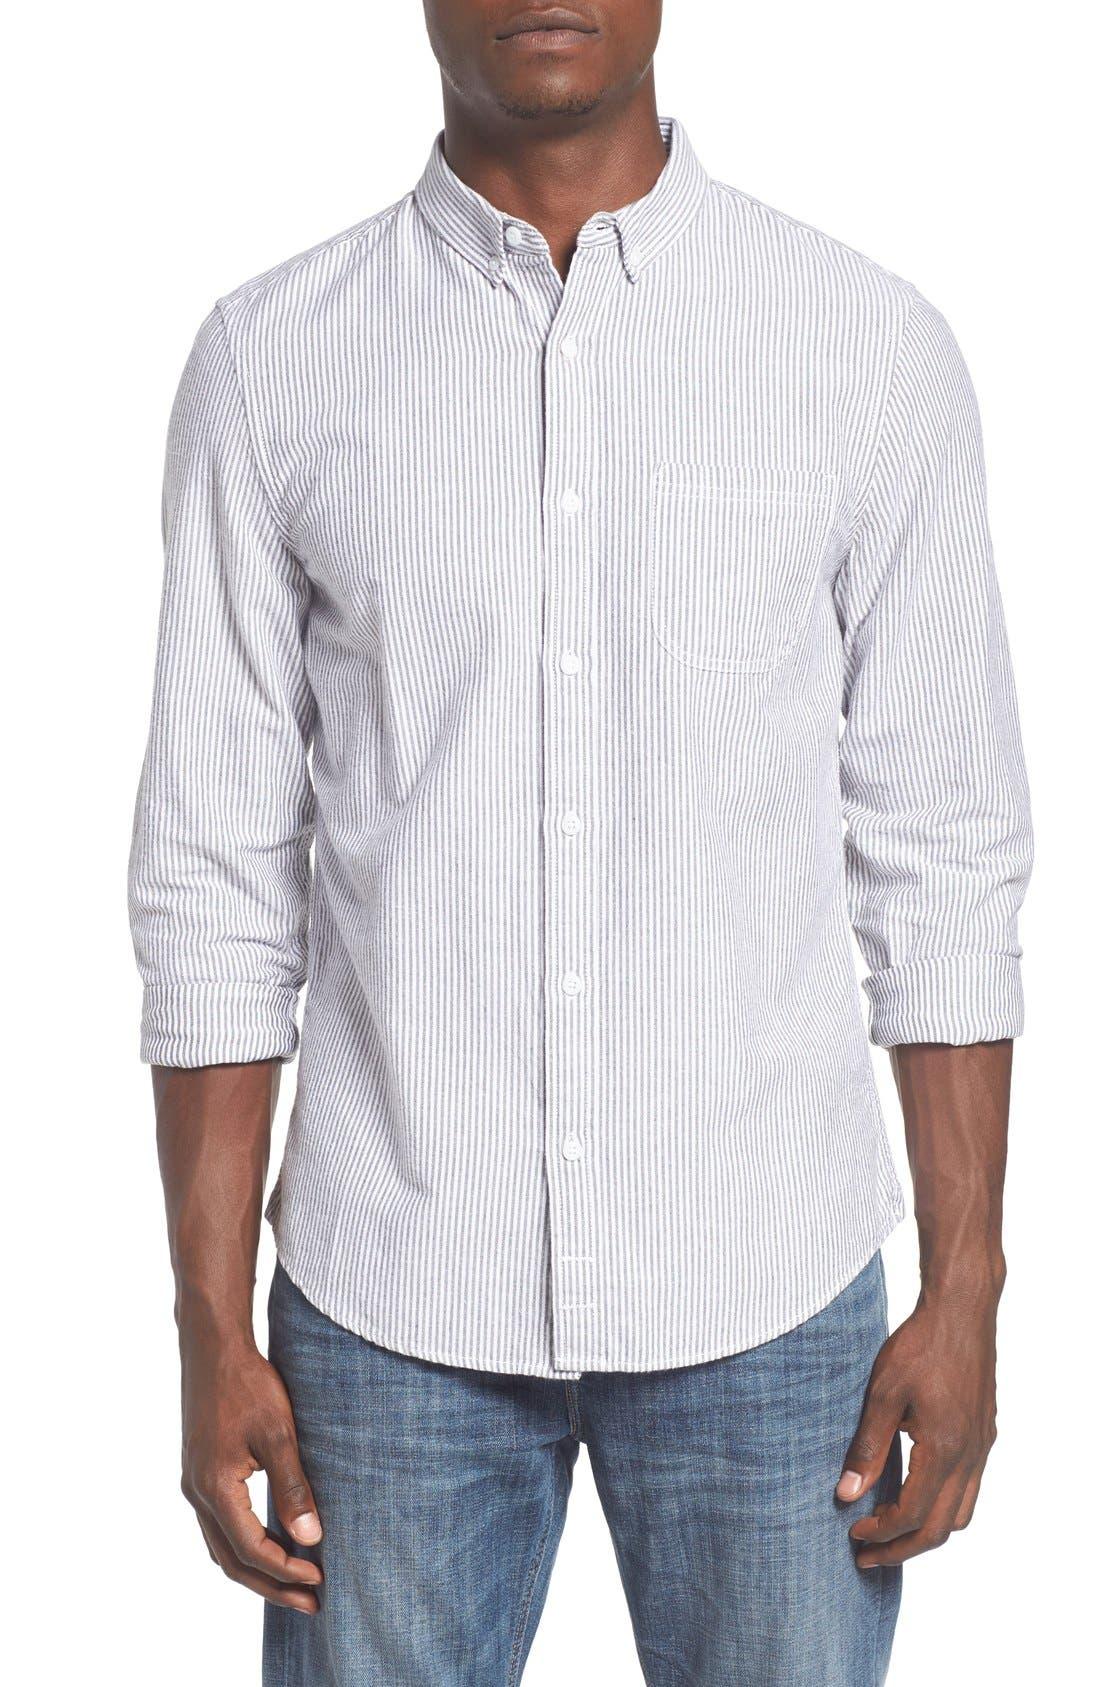 'Baker' Slim Fit Oxford Shirt,                             Main thumbnail 1, color,                             001